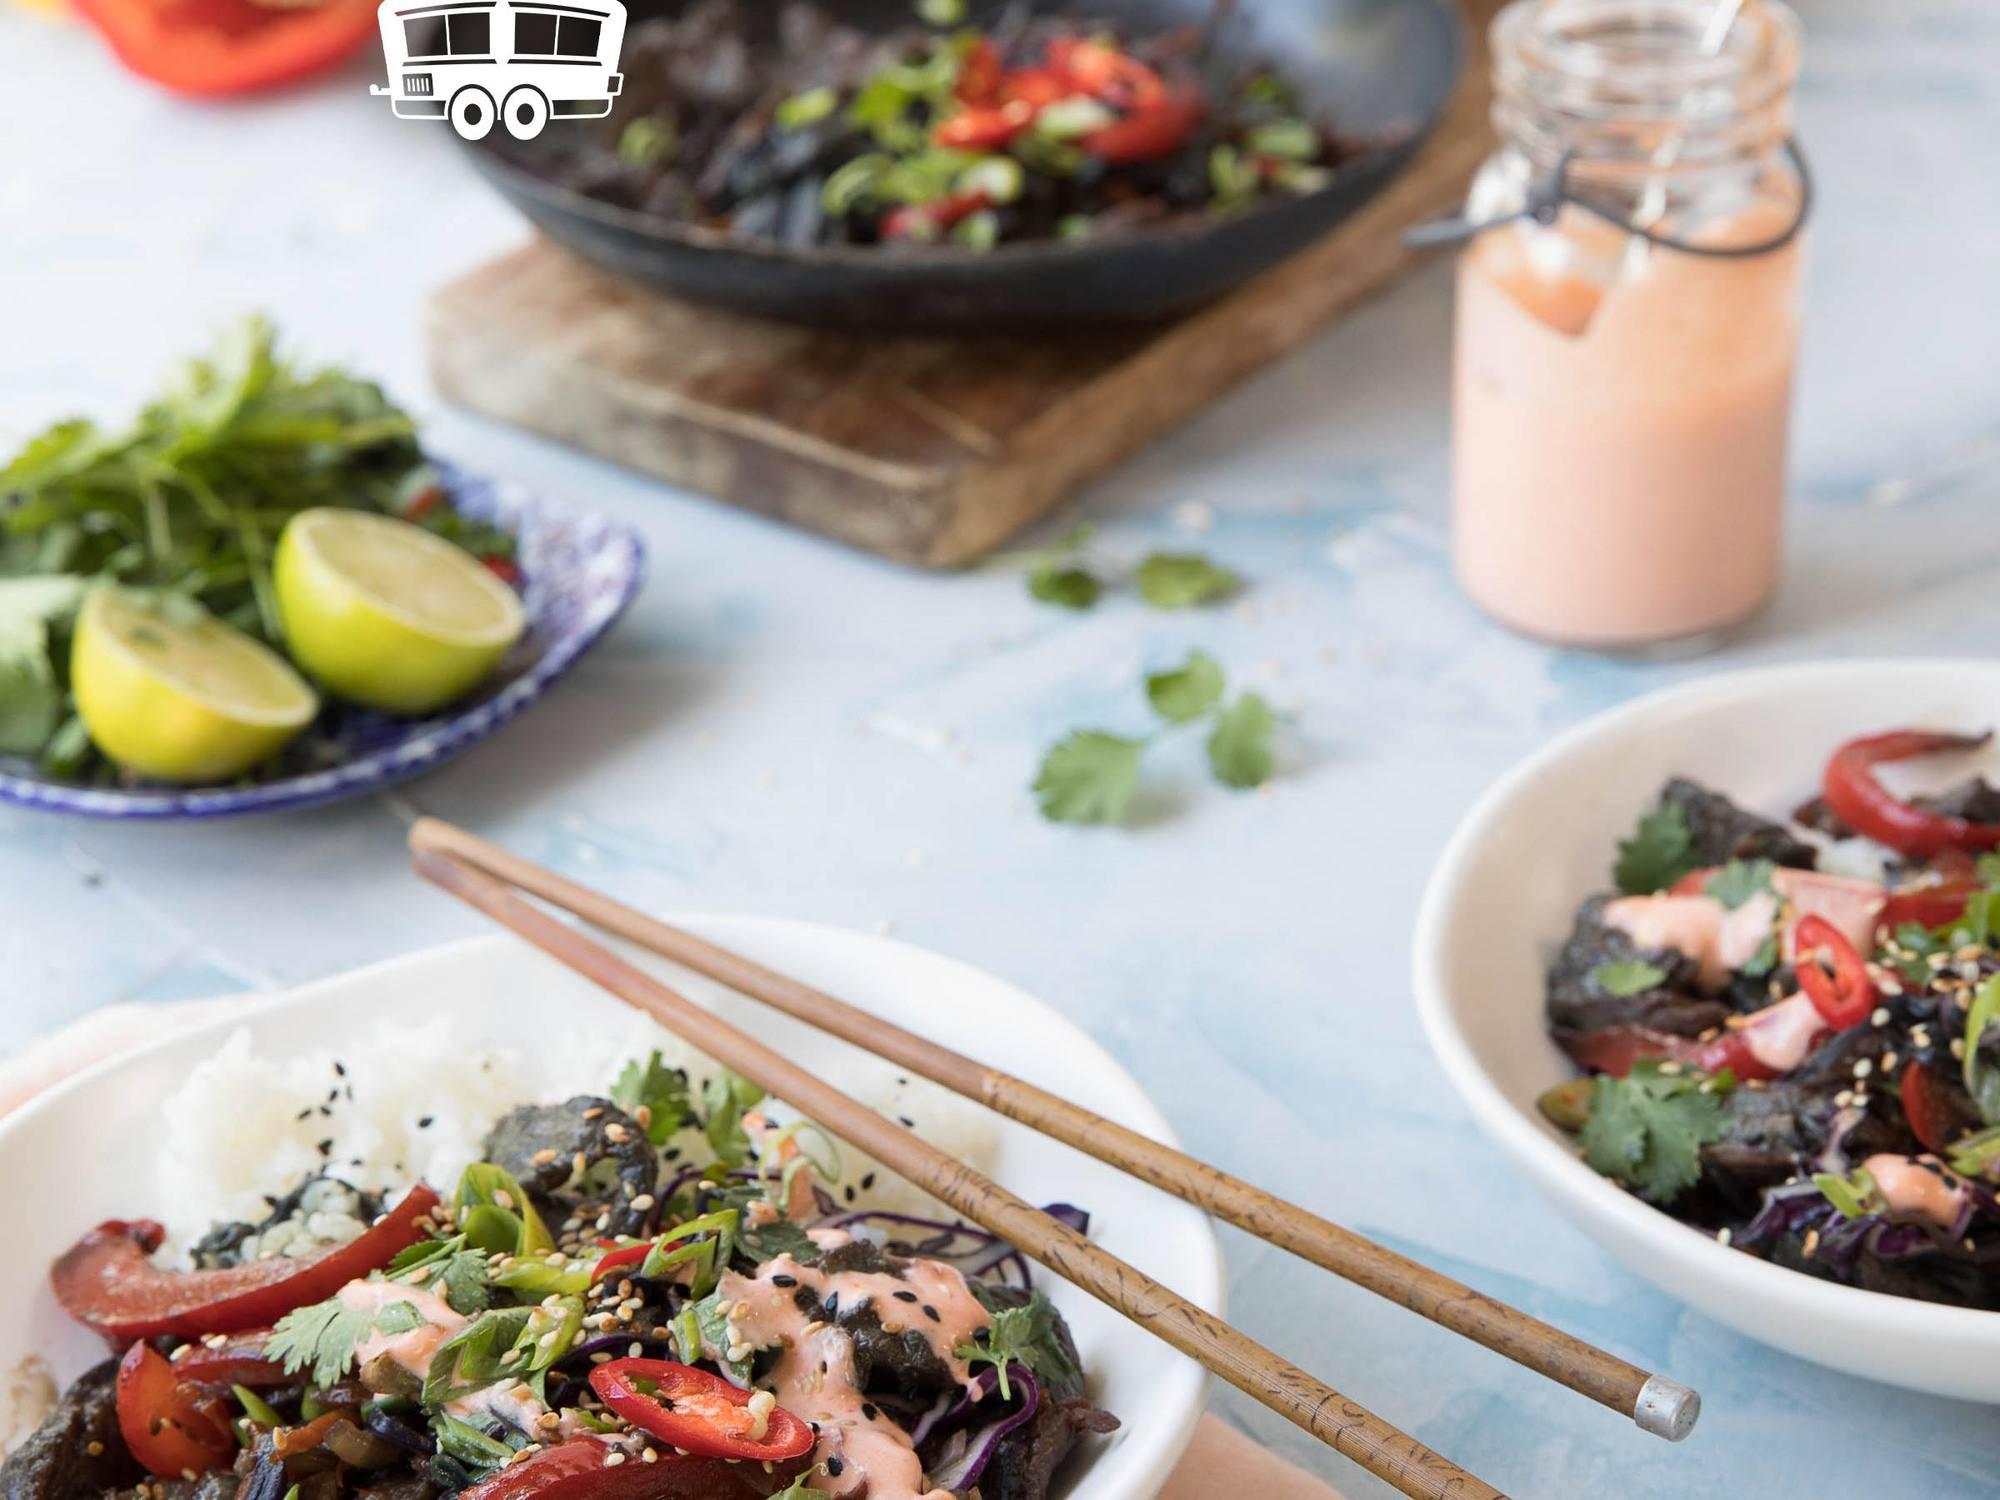 Korean-Style Beef and Vegetable Stir Fry